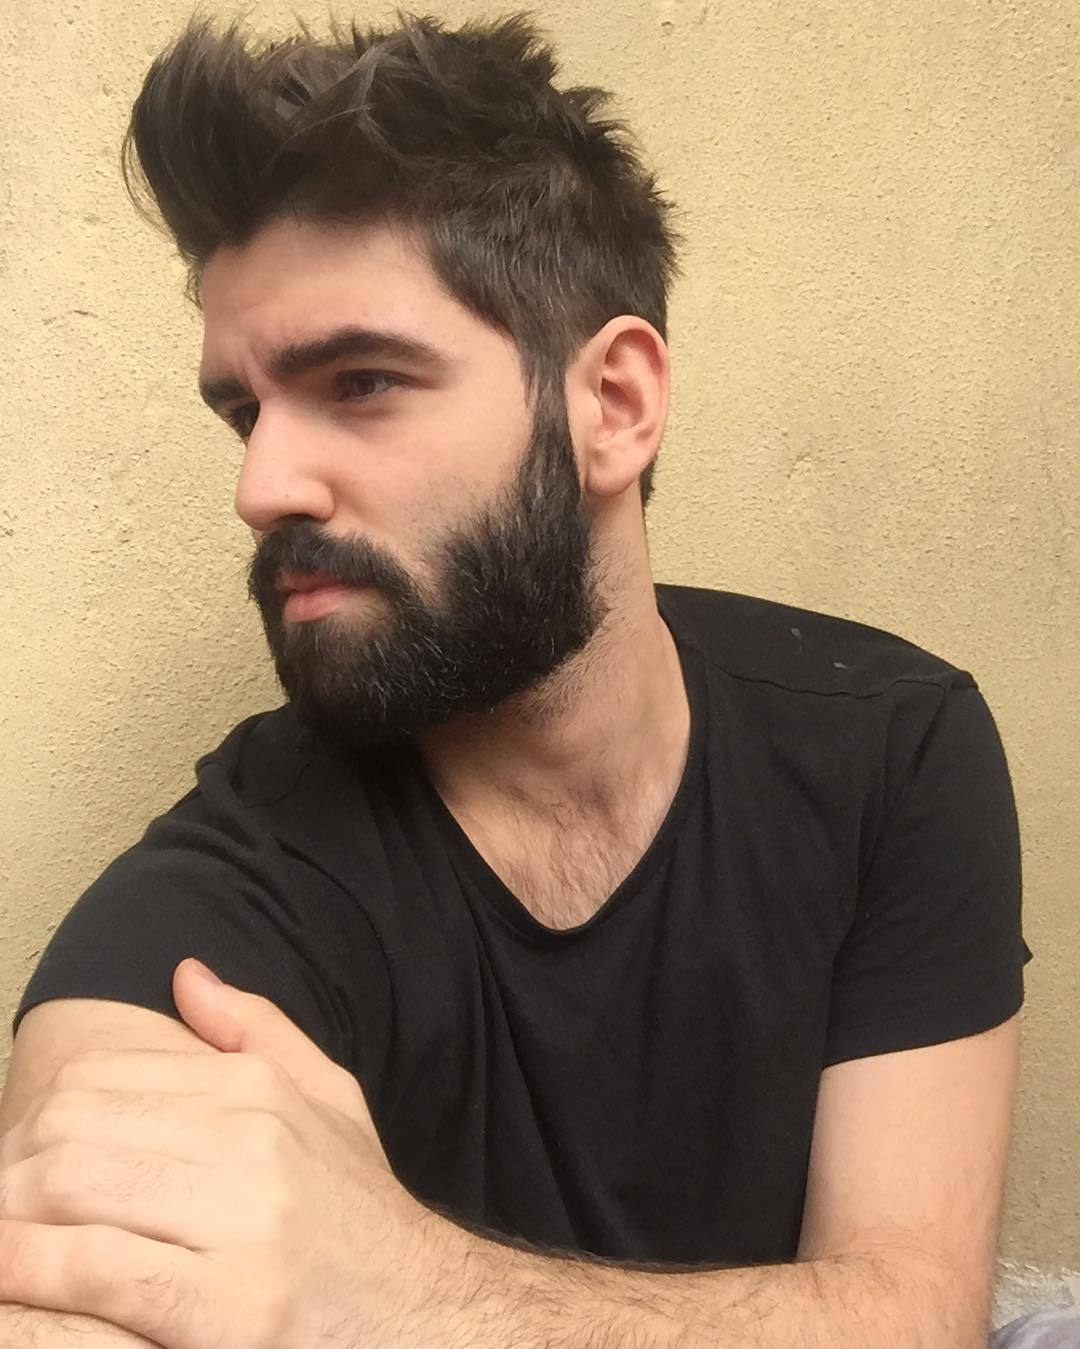 2018-06-04 05:21:37 - by mnuelss on instagram beardburnme http://www.neofic.com